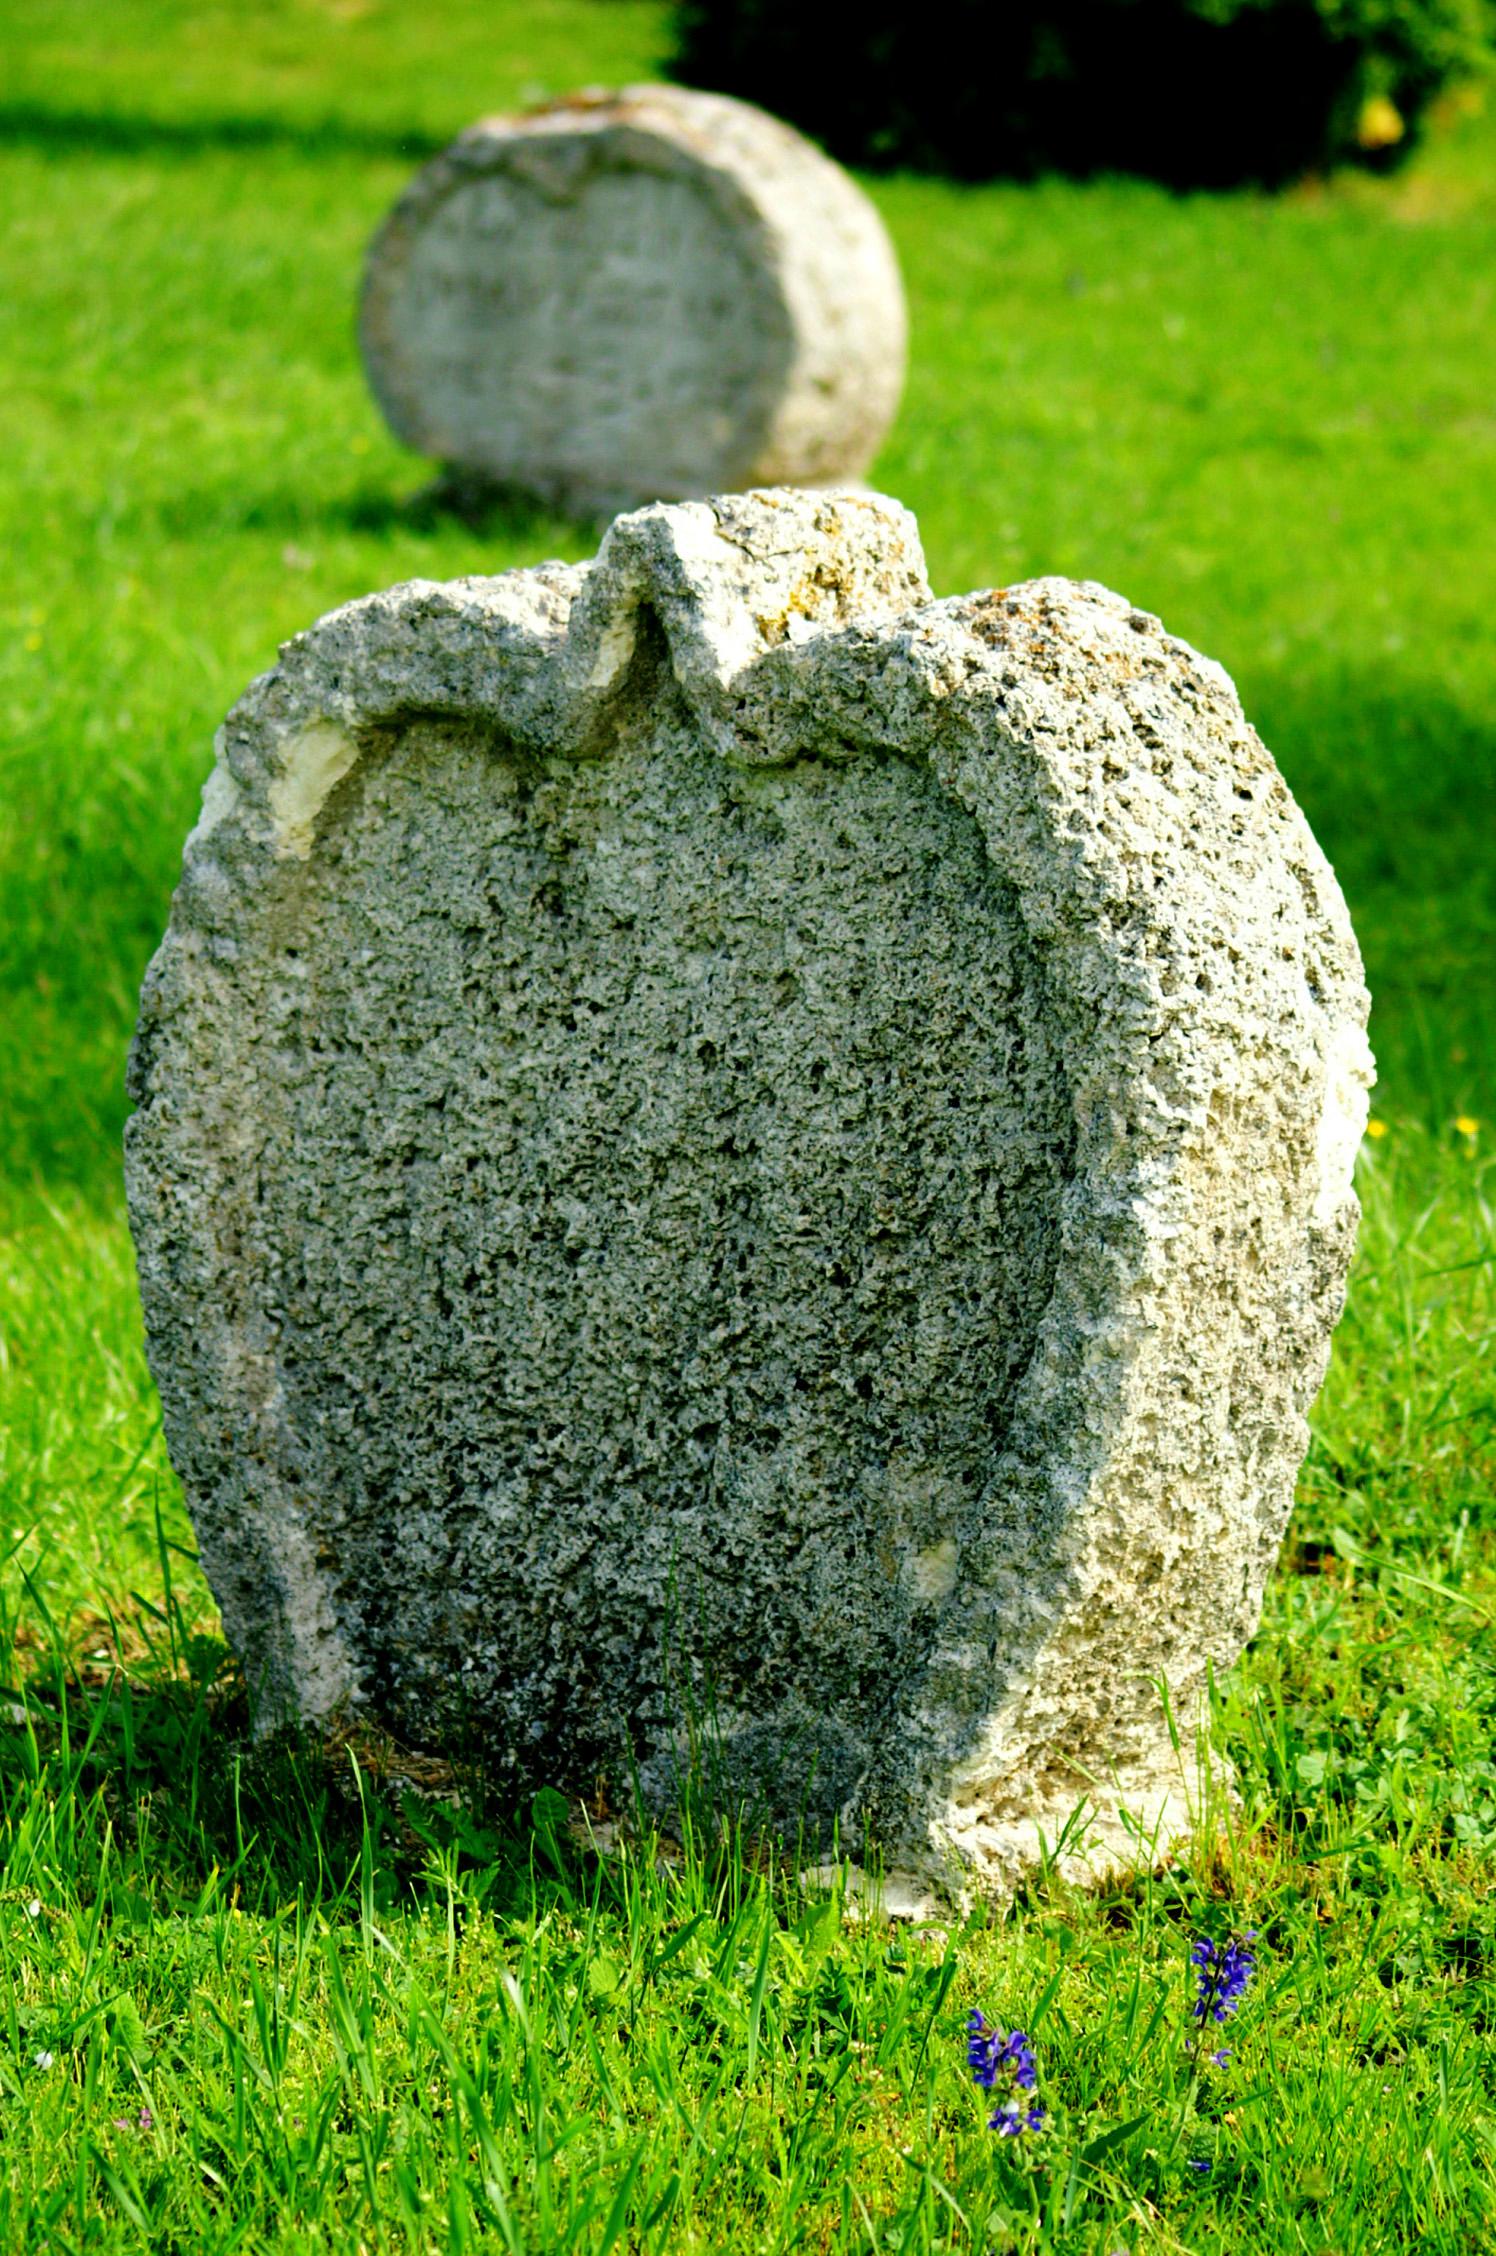 Szív alakú sírkövek - Balatonudvari